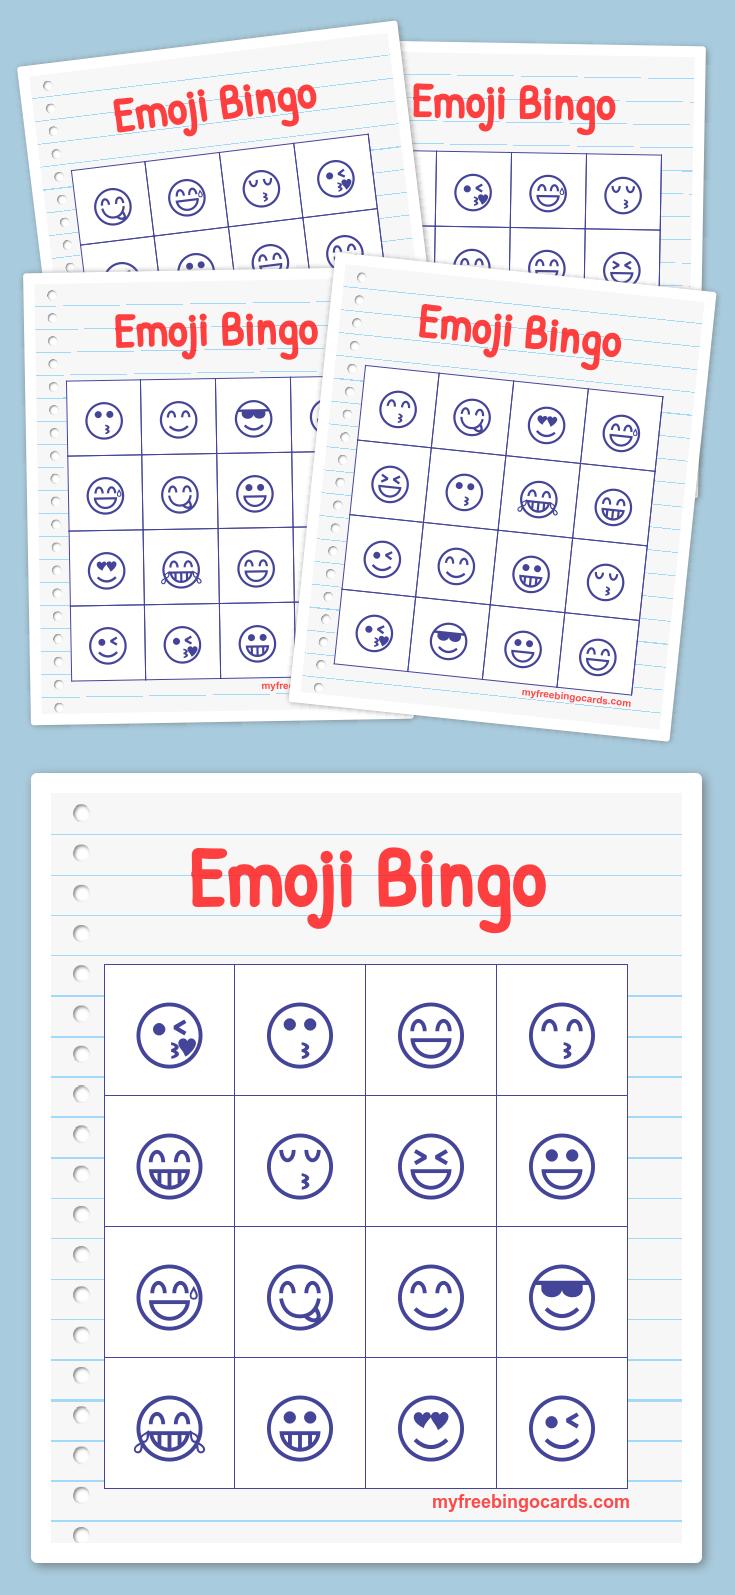 Free Printable Bingo Cards | londons birthday | Pinterest | Cards ...